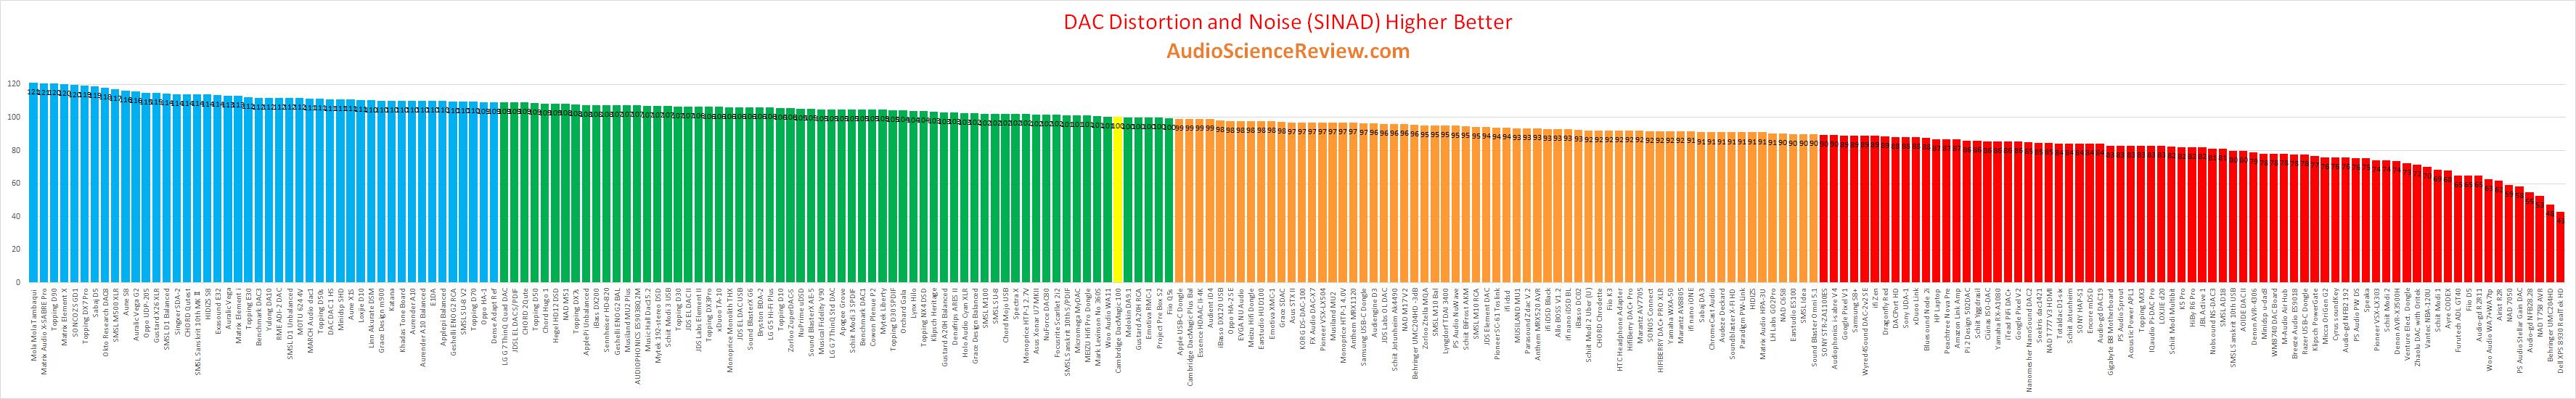 Best Desktop USB DAC Review 2020.png